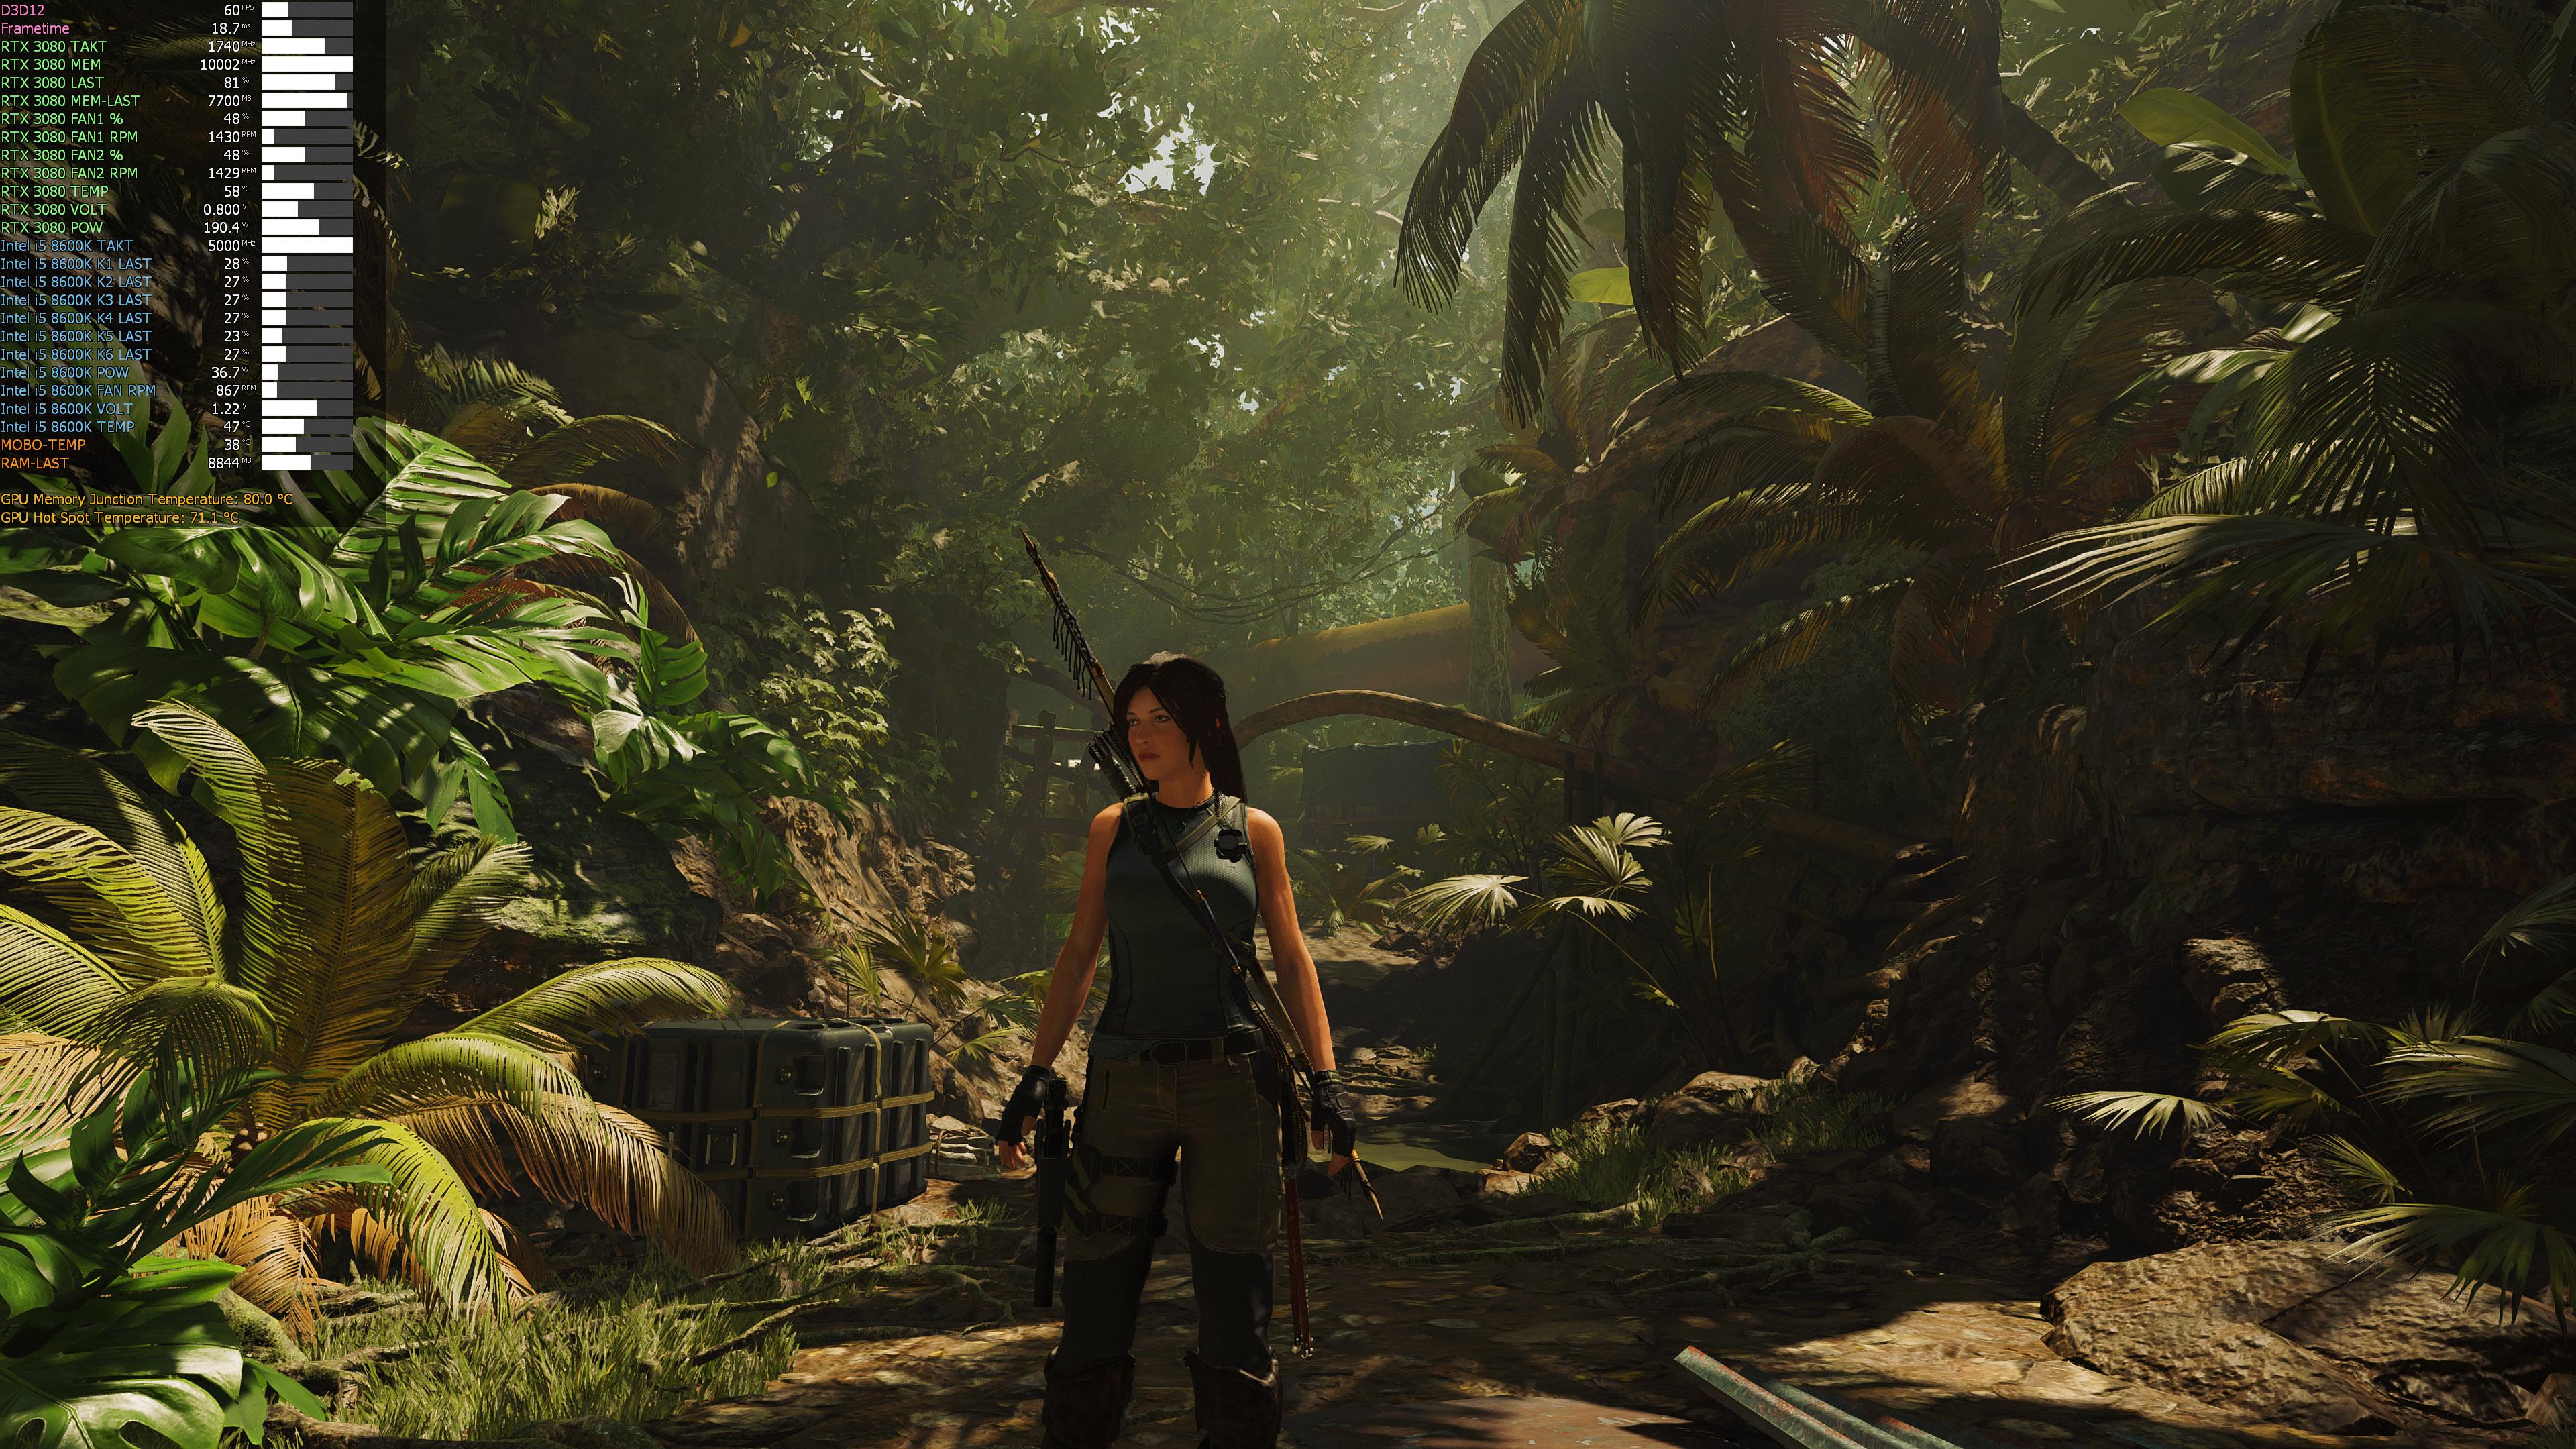 Shadow of the Tomb Raider Screenshot 2021.03.23 - 21.42.33.56-standard-width-3840px.jpg